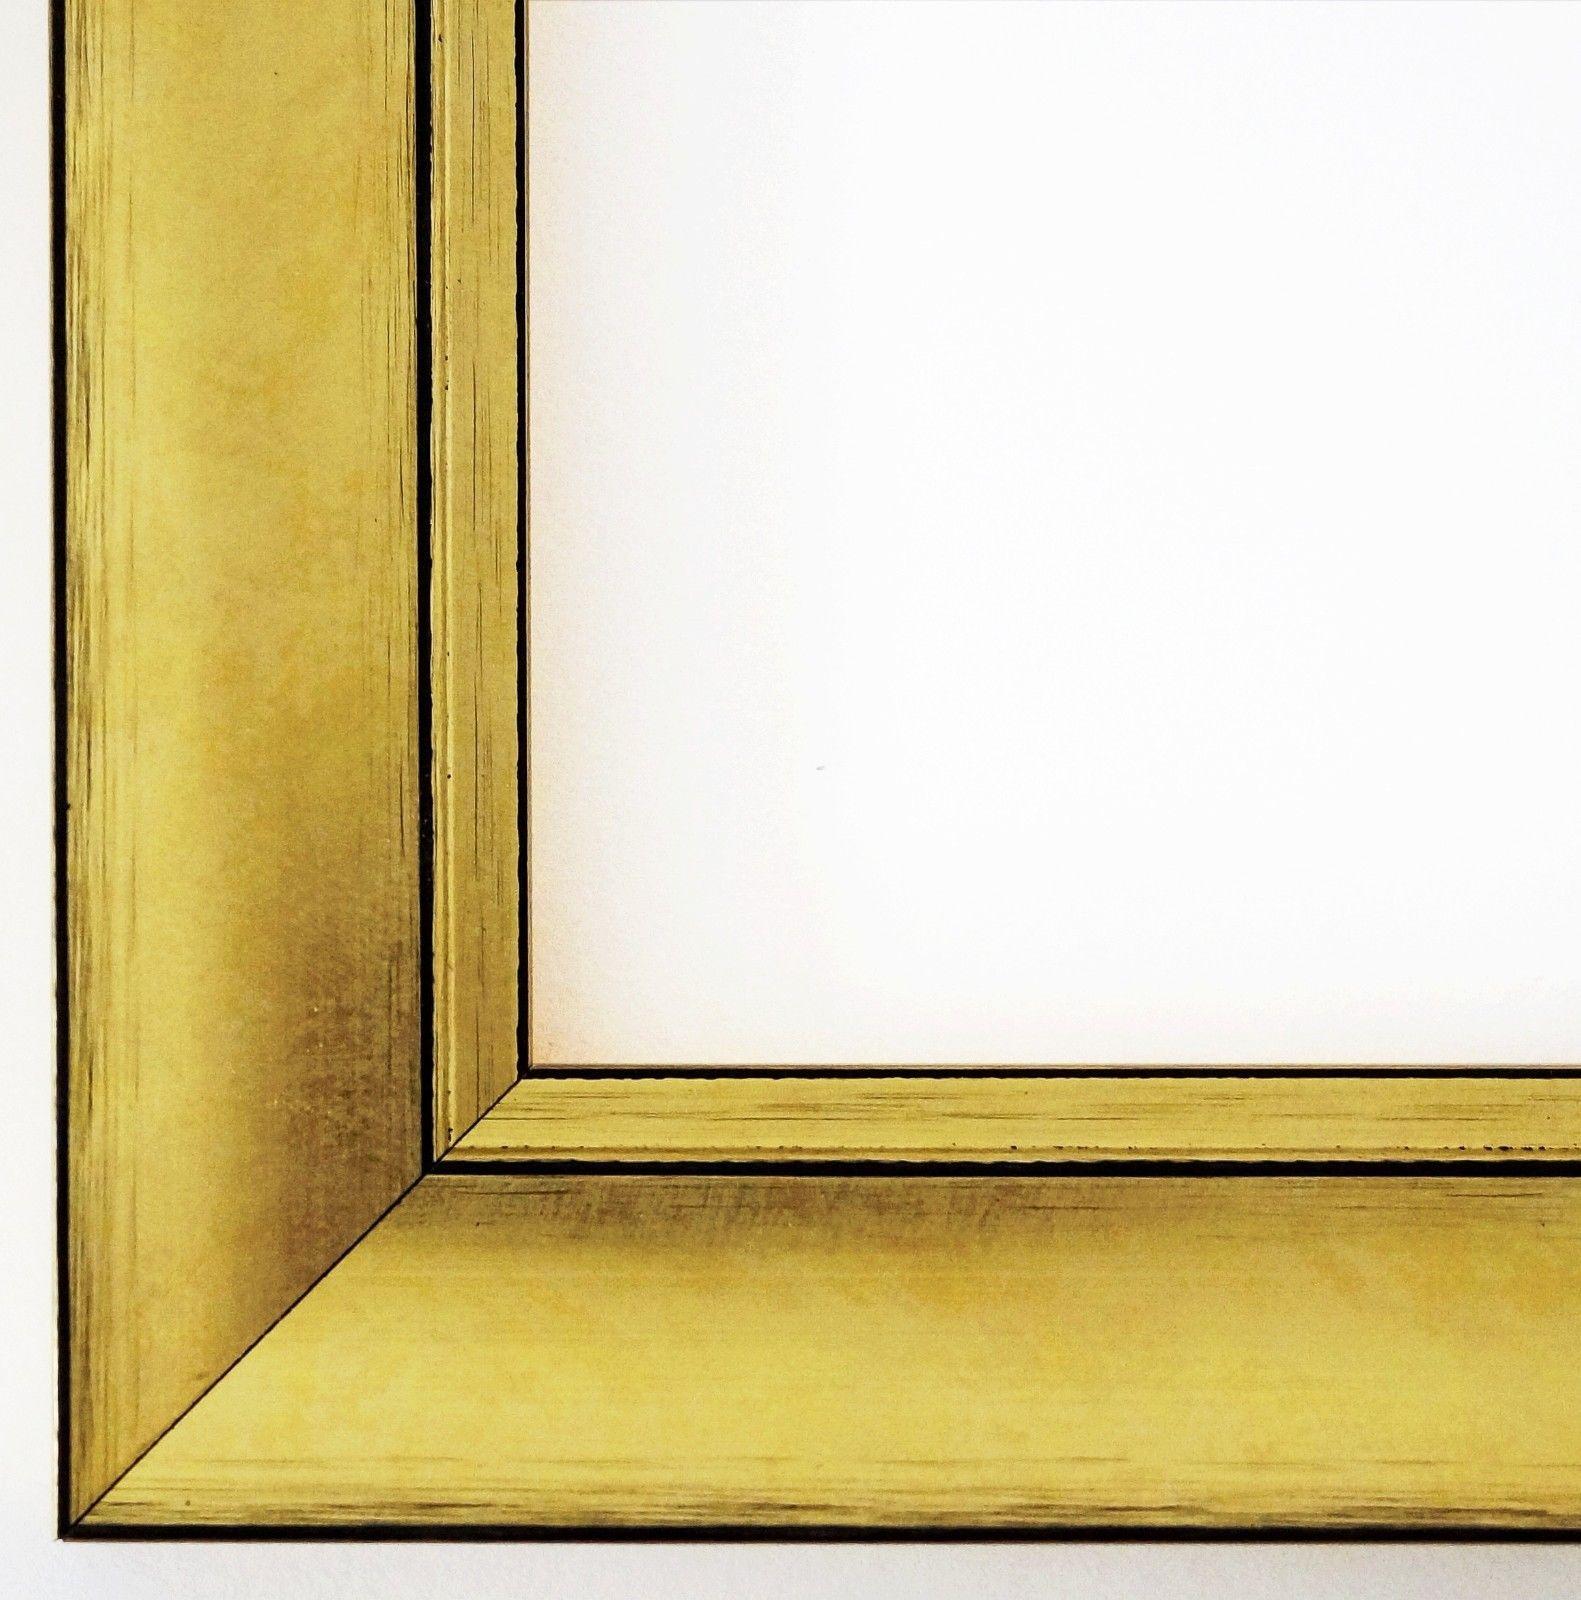 Bilderrahmen Gold Dortmund 4, 2 - 9x13 10x10 10x15 13x18 15x20 18x24 ...